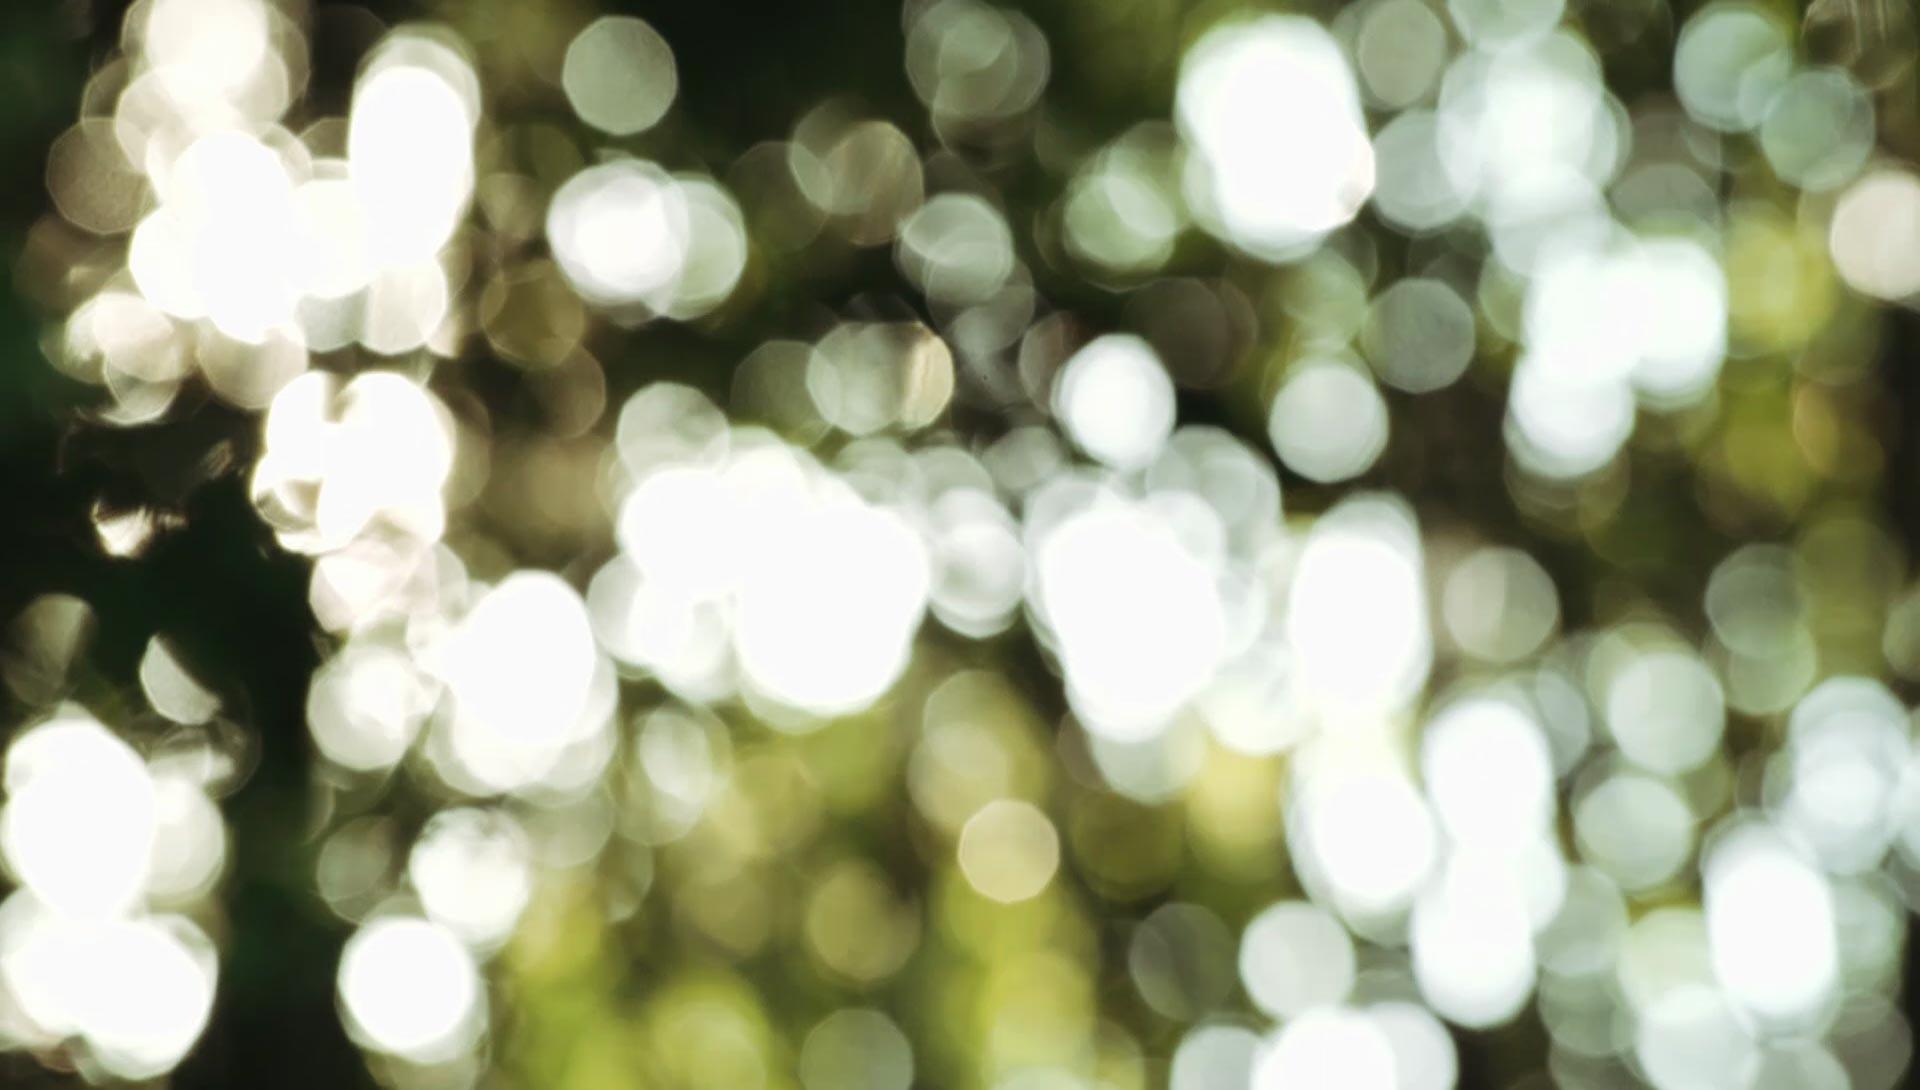 Dappled light seen through clumps of bamboo at Daruma ecovillage